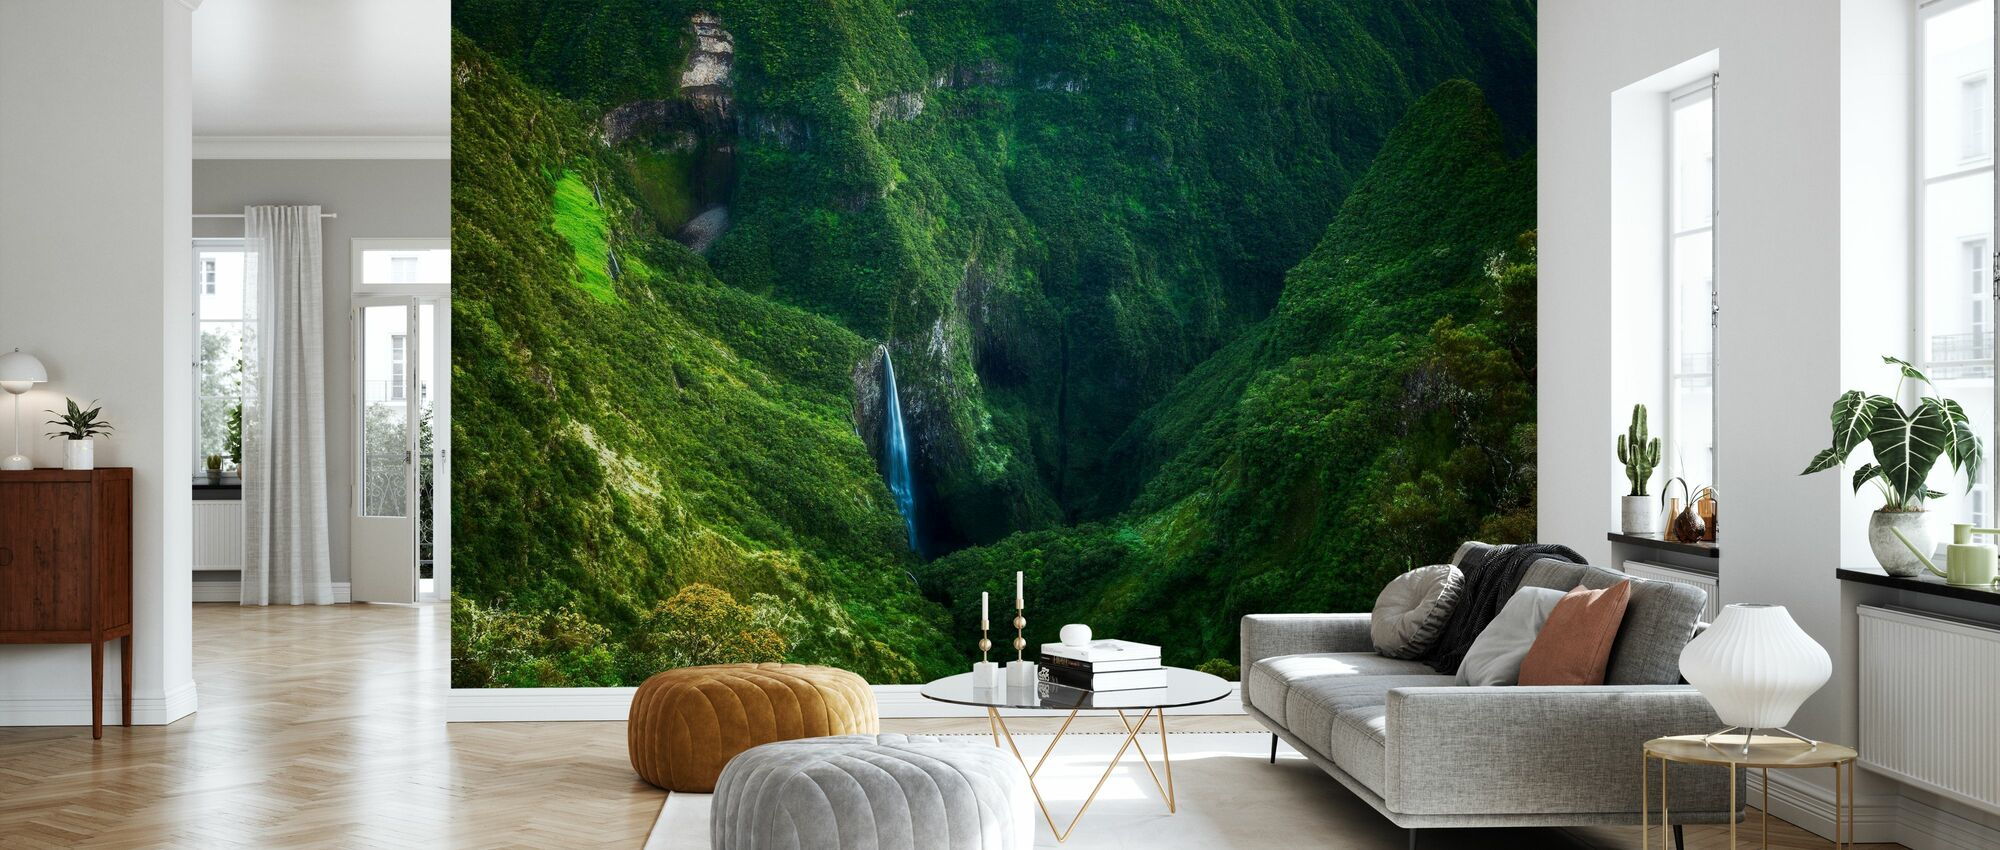 Iron Hole - Wallpaper - Living Room